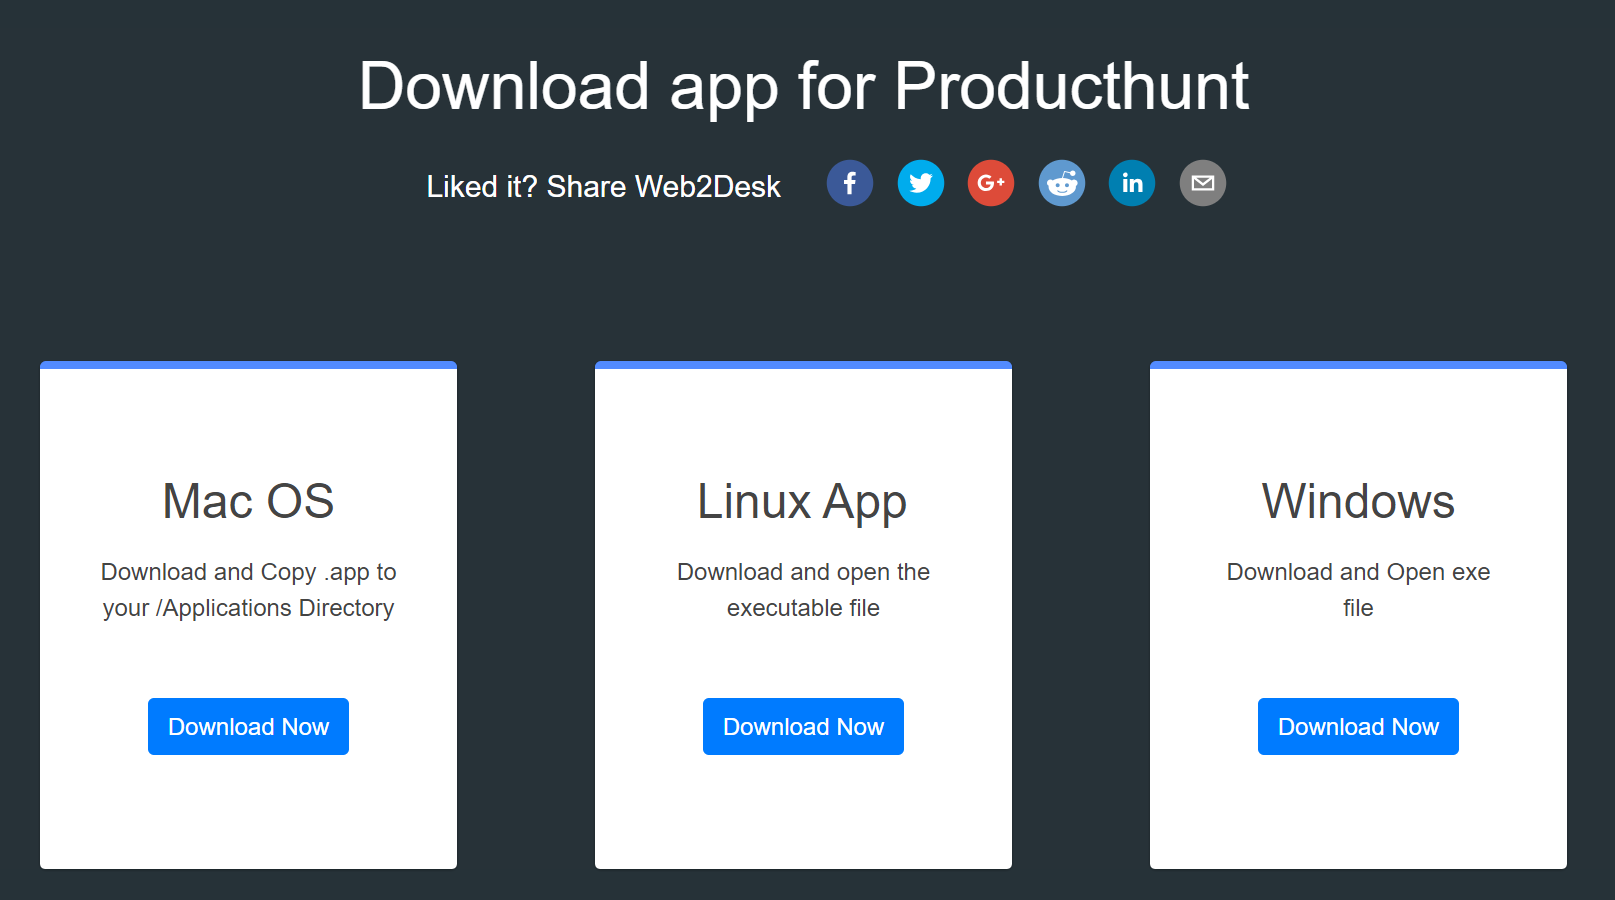 Linux Desktop apps